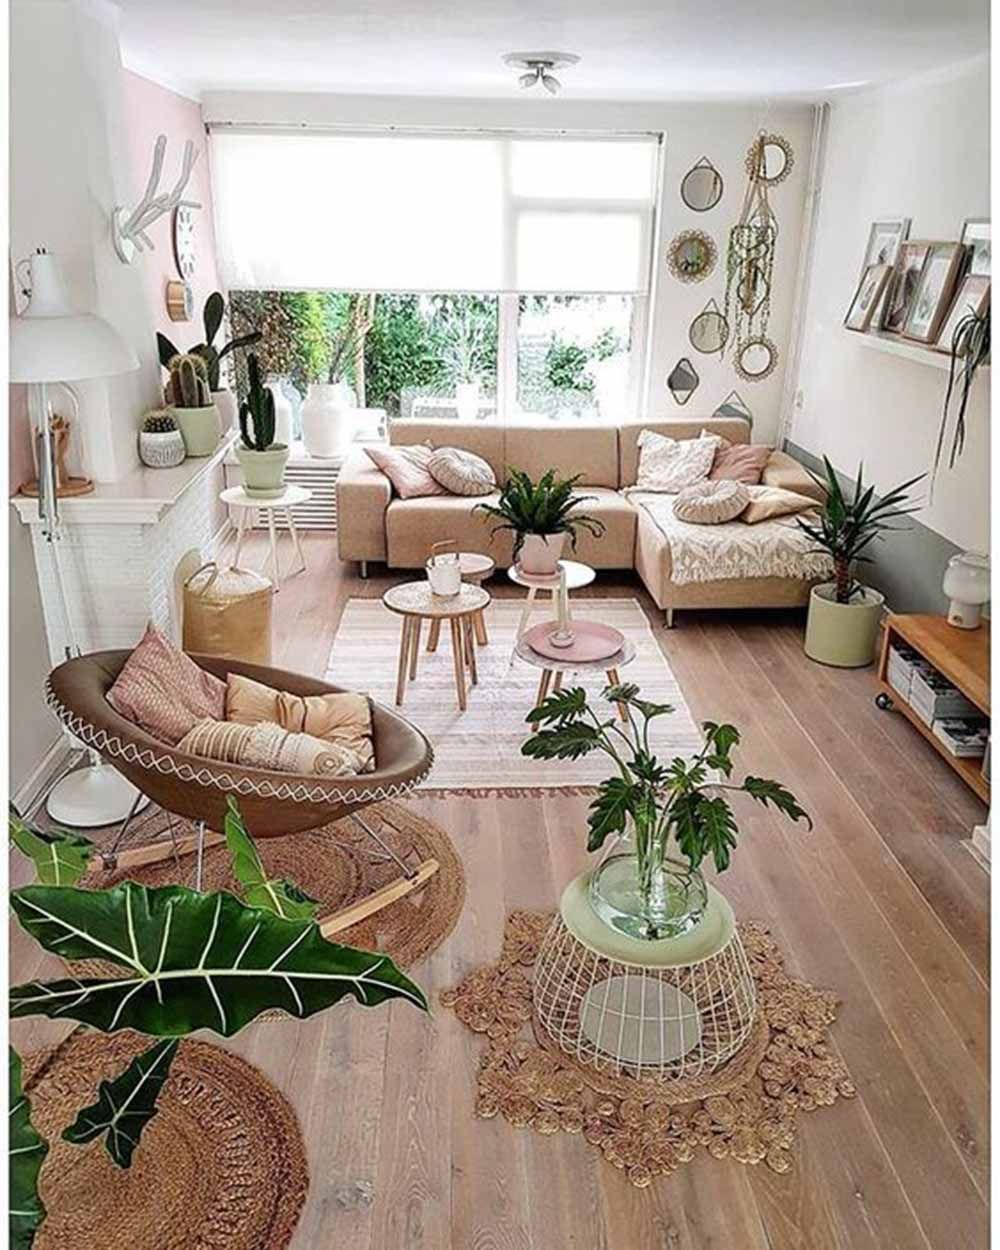 15 Adorable Summer Living Room Decor Ideas Those You Can Copy Summer Living Room Bohemian Living Room Decor Summer Living Room Decor Summer living room decor